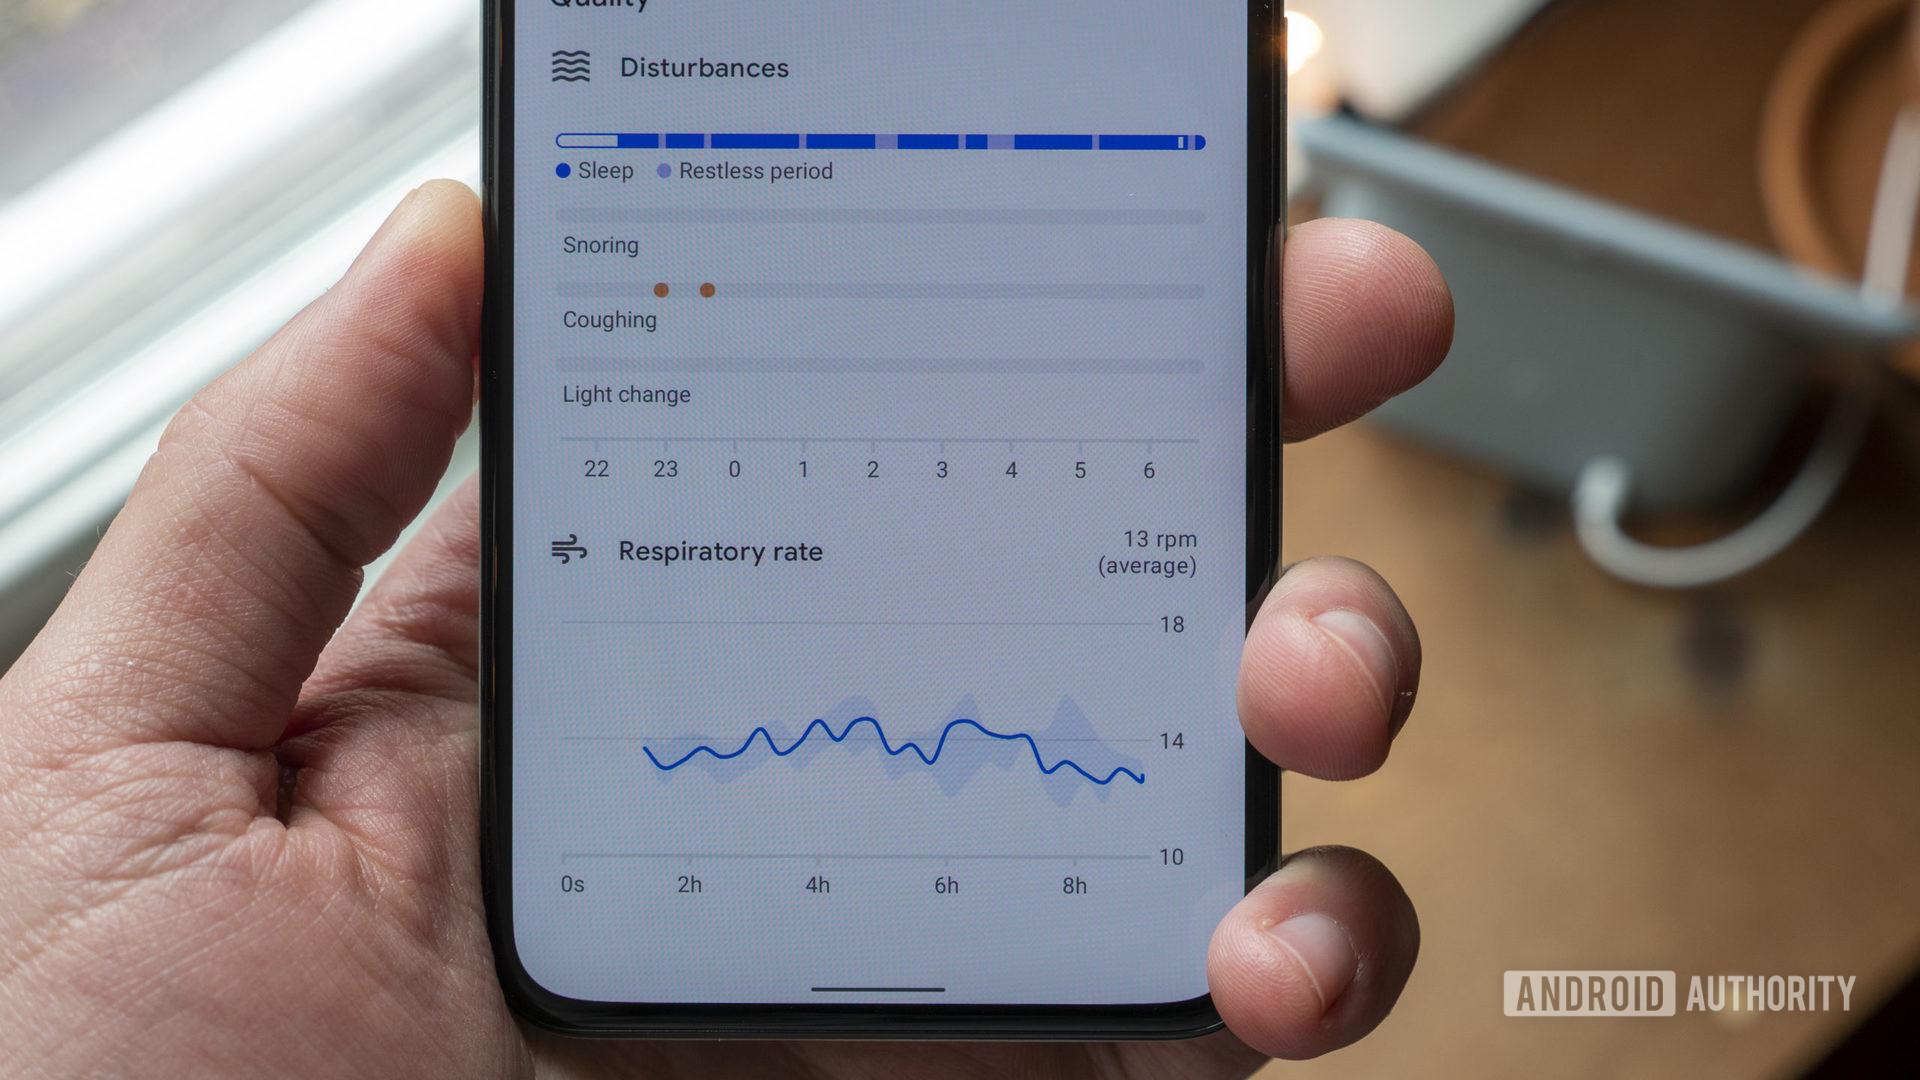 google nest hub second generation review google fit sleep sensing disturbances respiratory rate